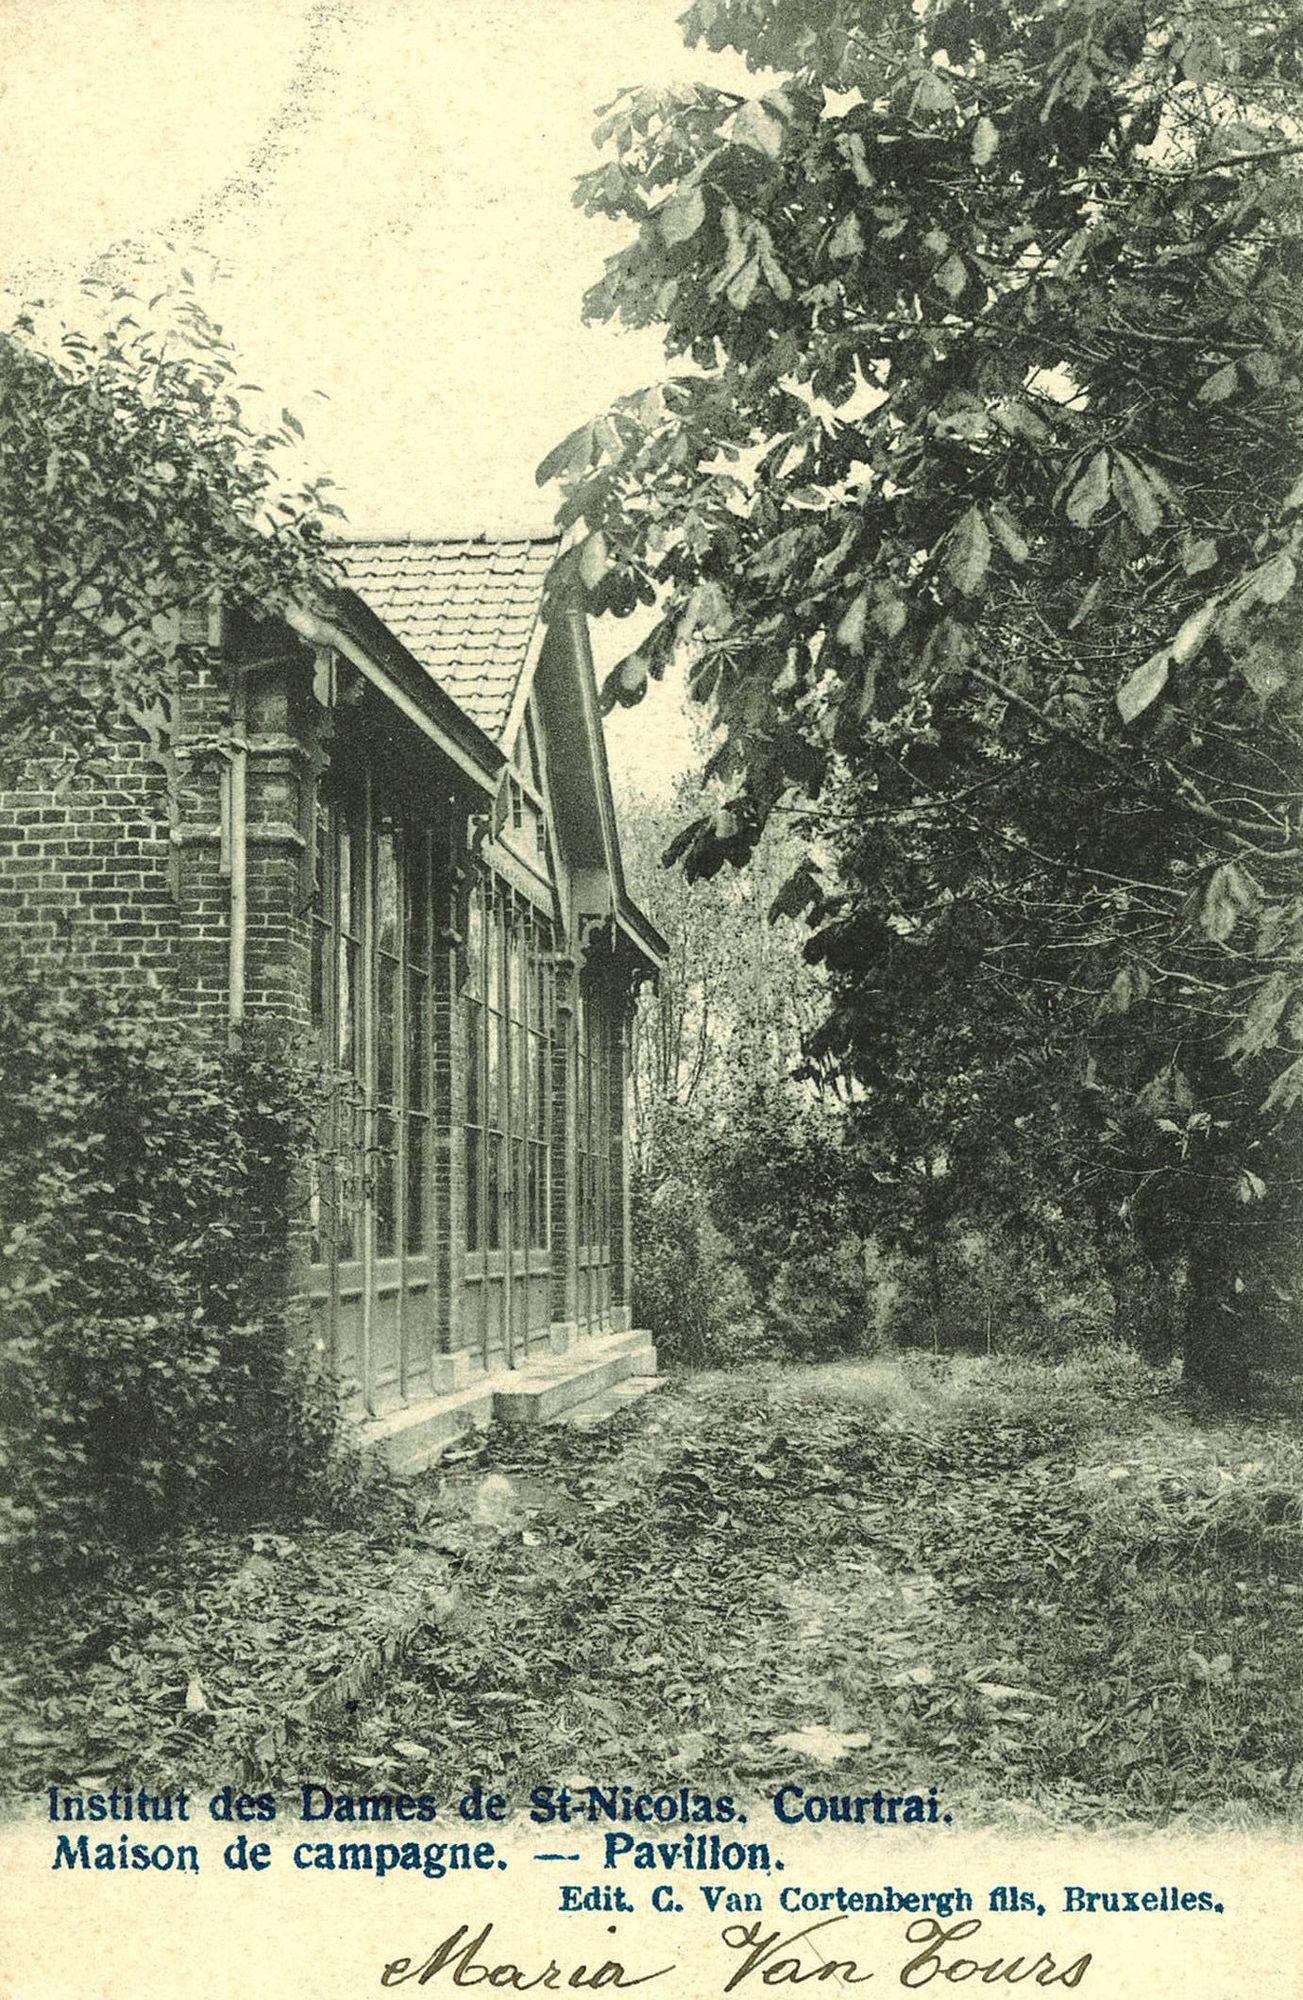 Landhuis van het Sint-Niklaasinstituut